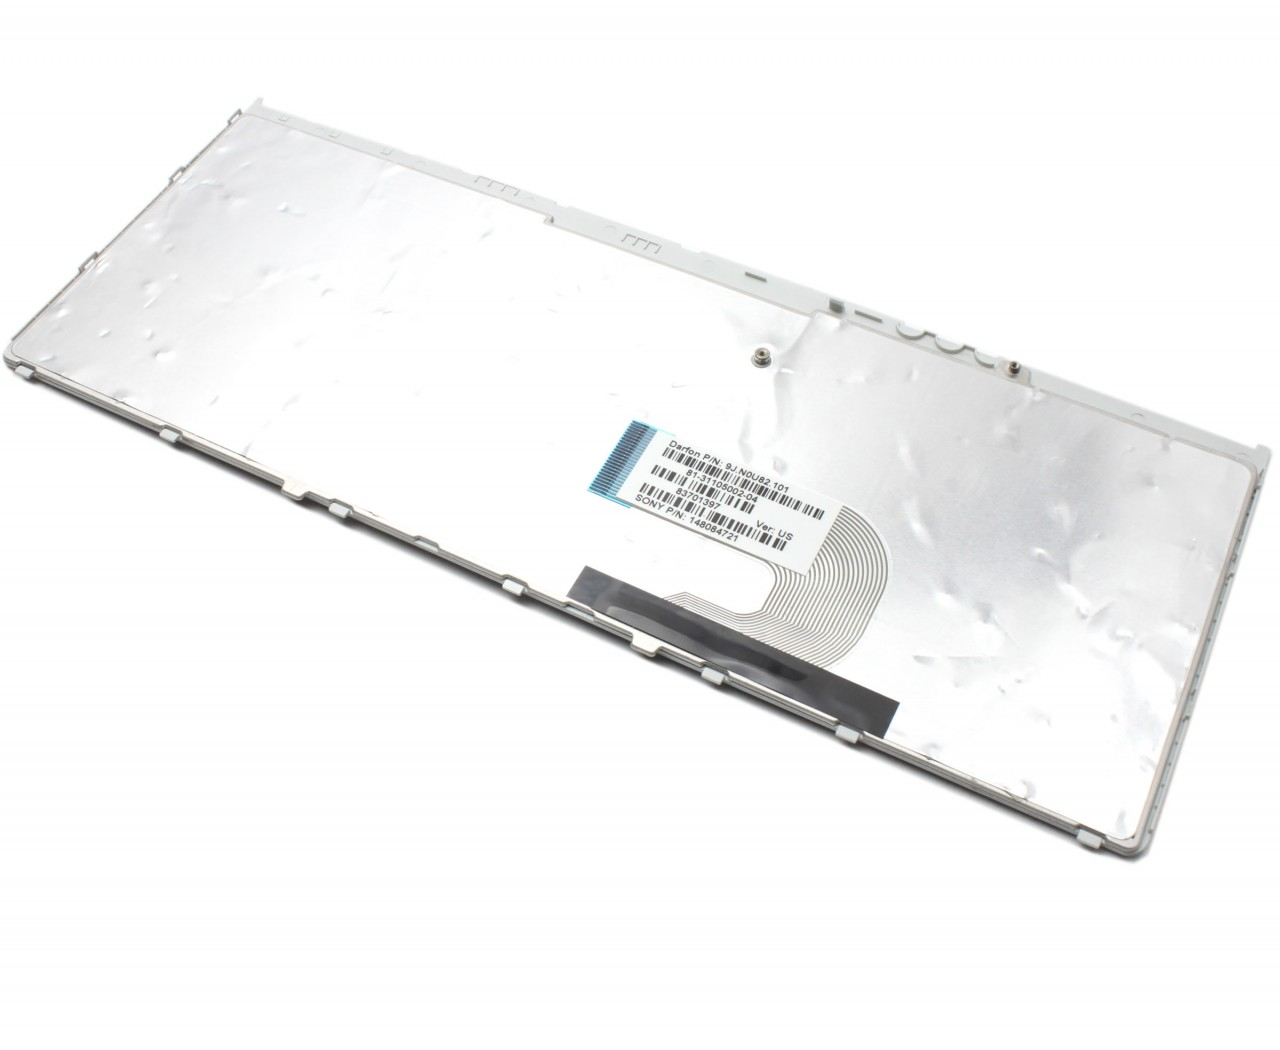 Tastatura Sony Vaio VGN-FW41M/H neagra cu rama gri imagine powerlaptop.ro 2021